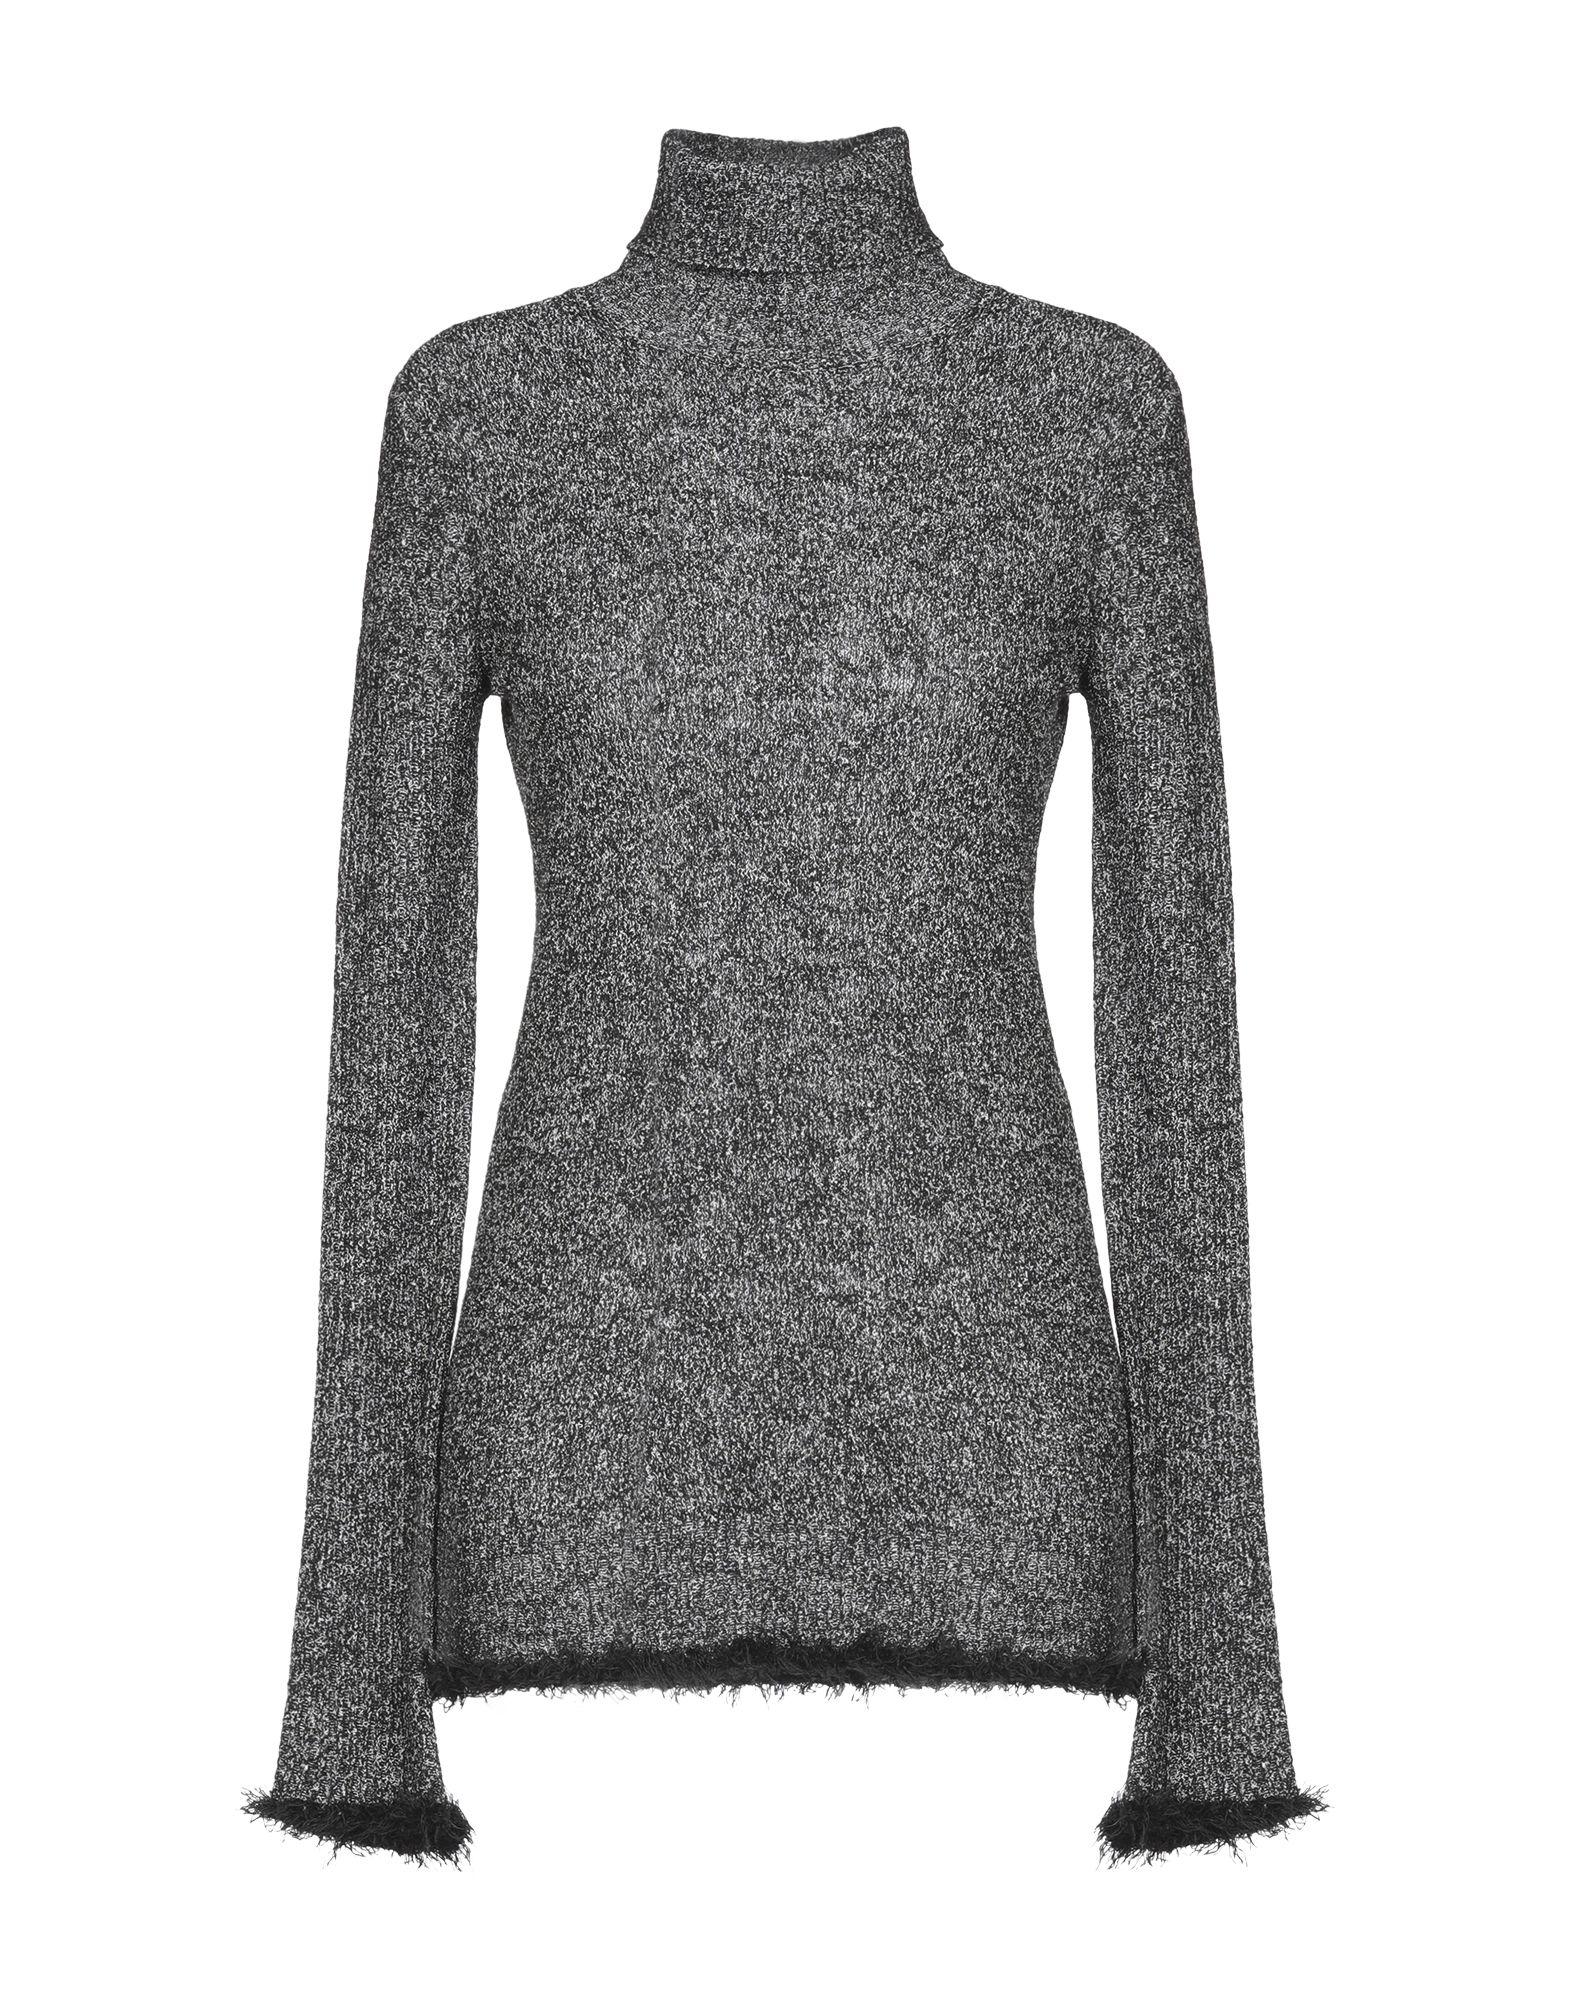 knitted, mélange, fringe, two-tone, turtleneck, lightweight sweater, long sleeves, no pockets.